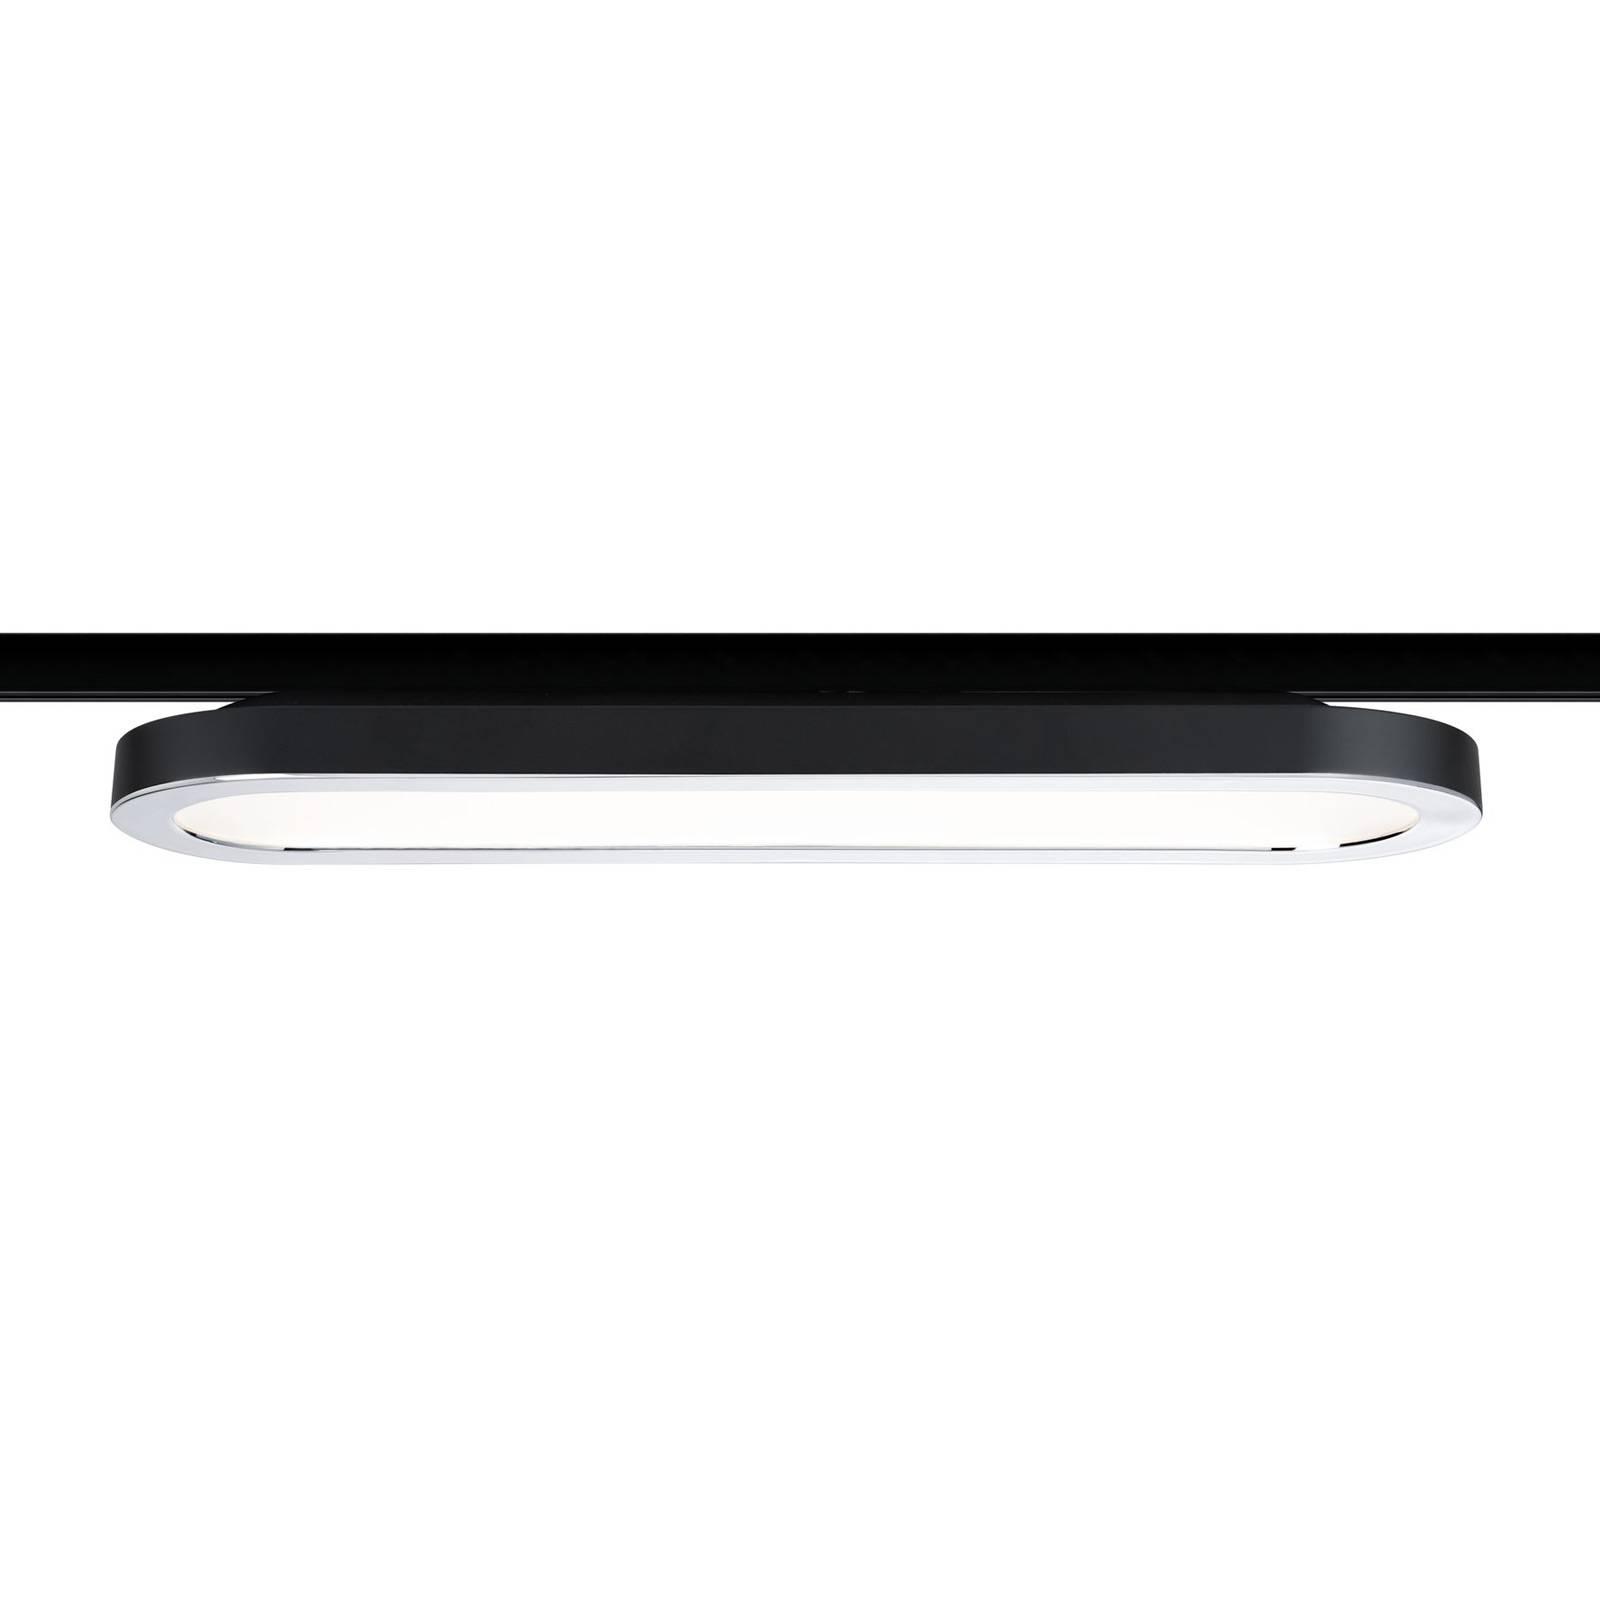 Paulmann URail LED-Panel 7W 2 700 K mattamusta